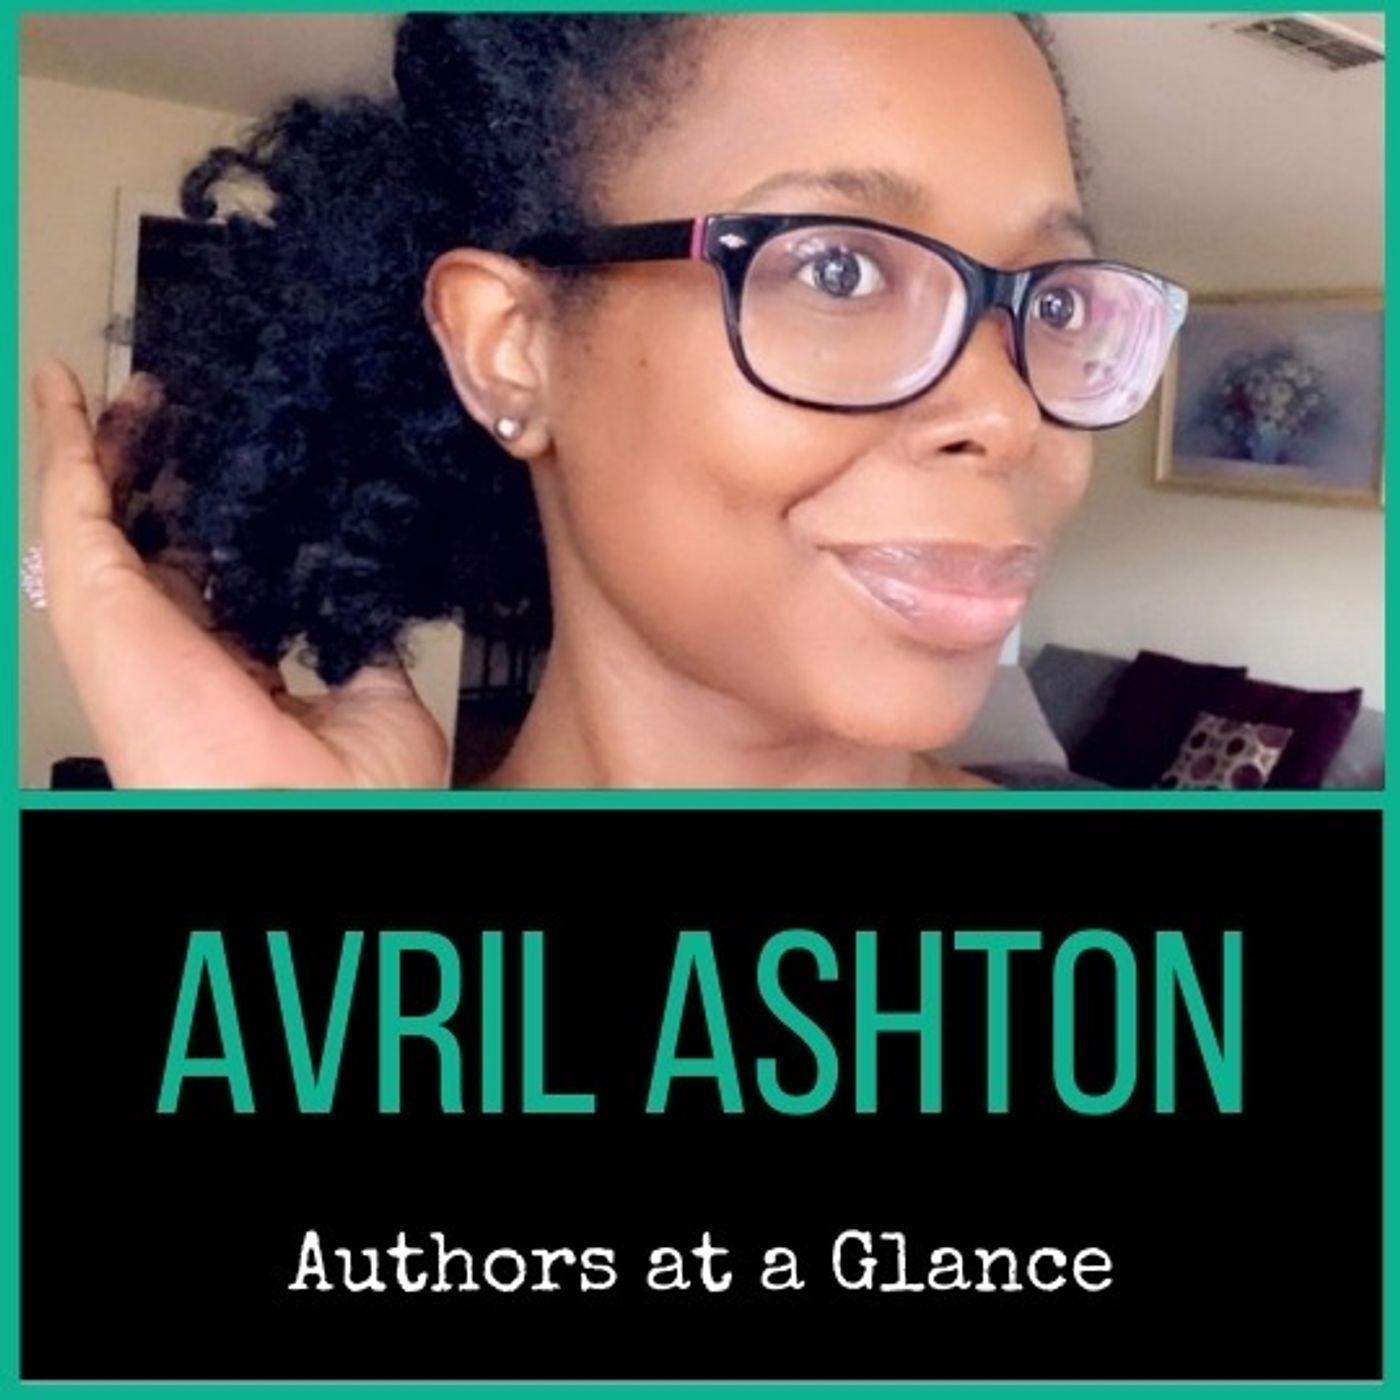 Avril Ashton | Authors at a Glance